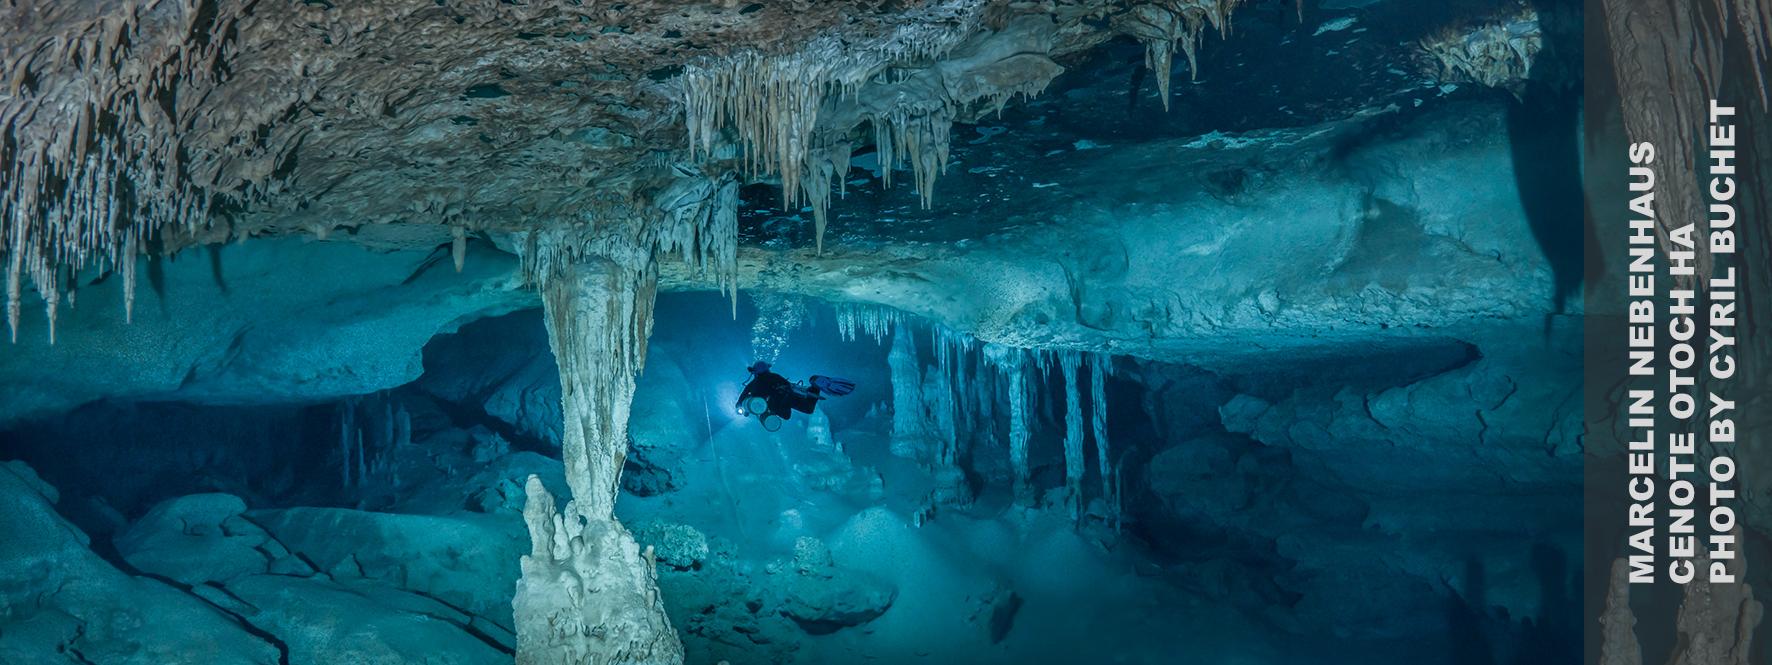 Marcelin Nebenhaus, Marcelin Cave Diving, Under the Jungle, Marcelin Under the Jungle